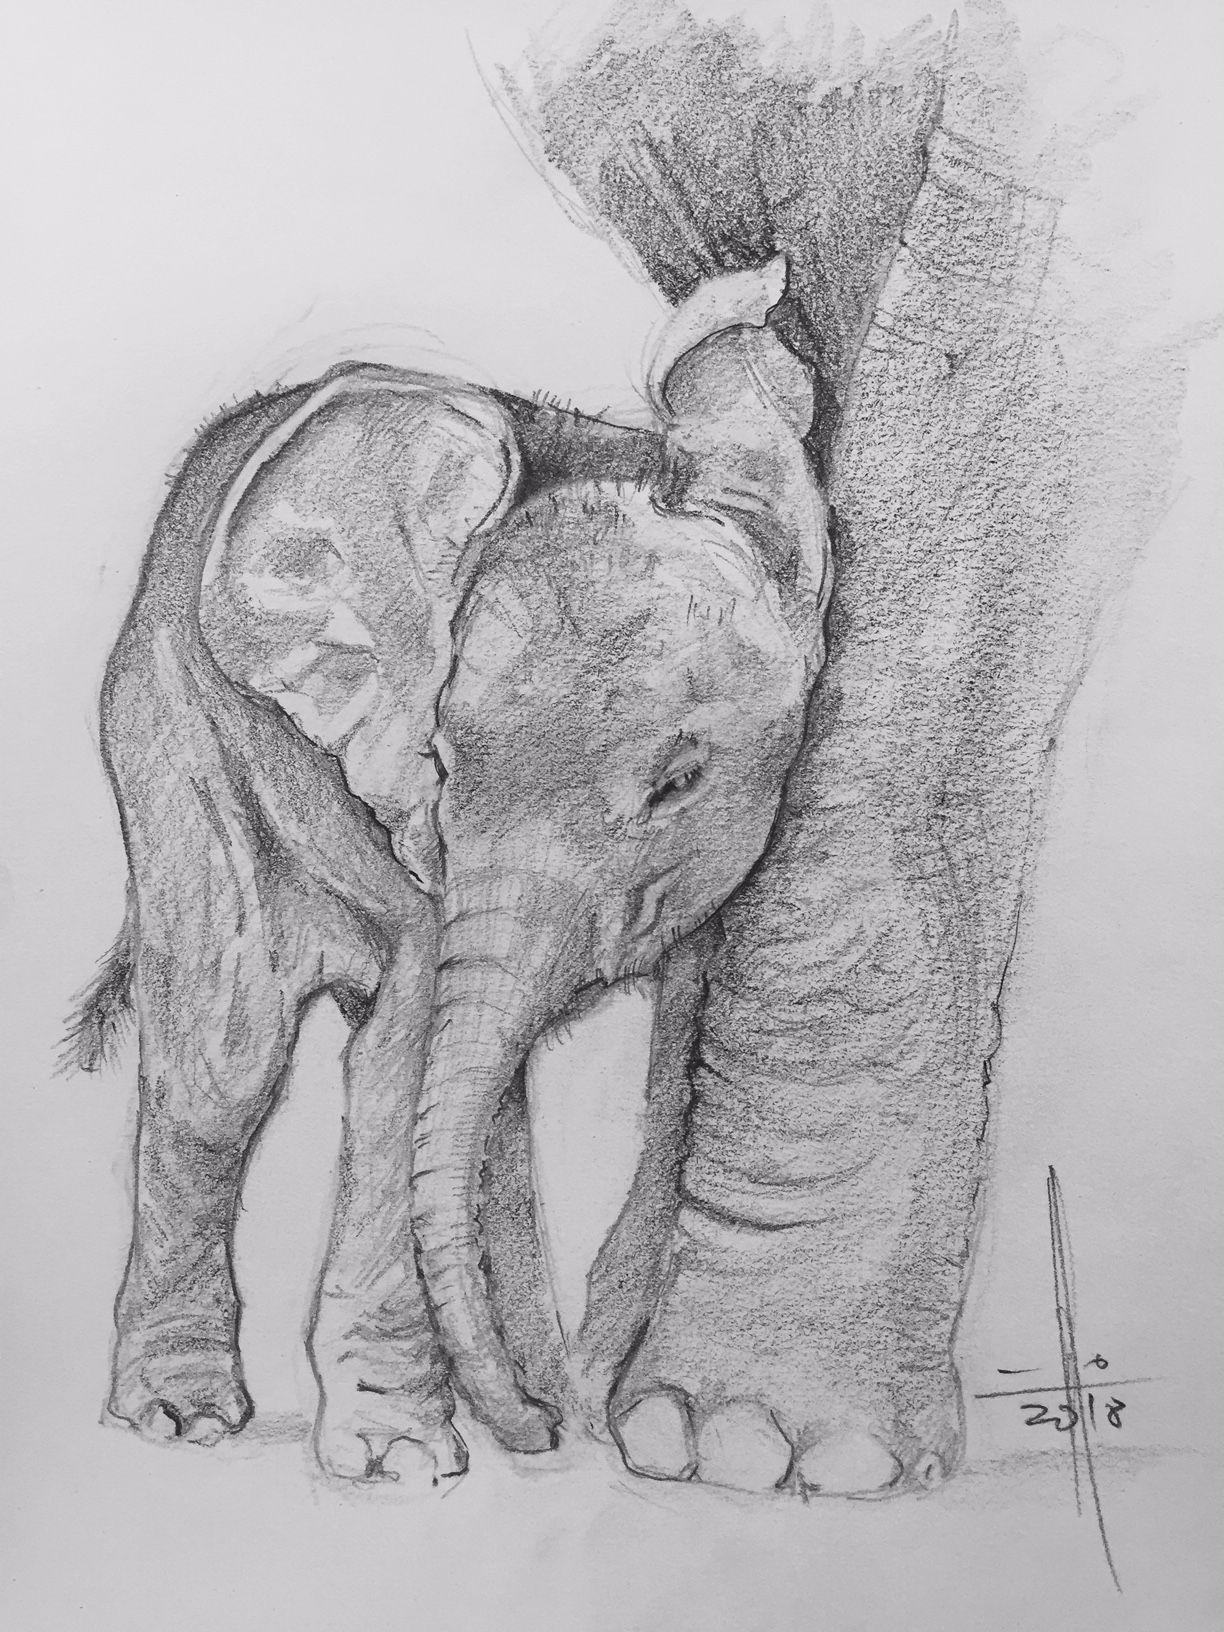 Dibujo Elefante Con Su Madre Francisco Javier Abellan Elefantes Animales Jirafas